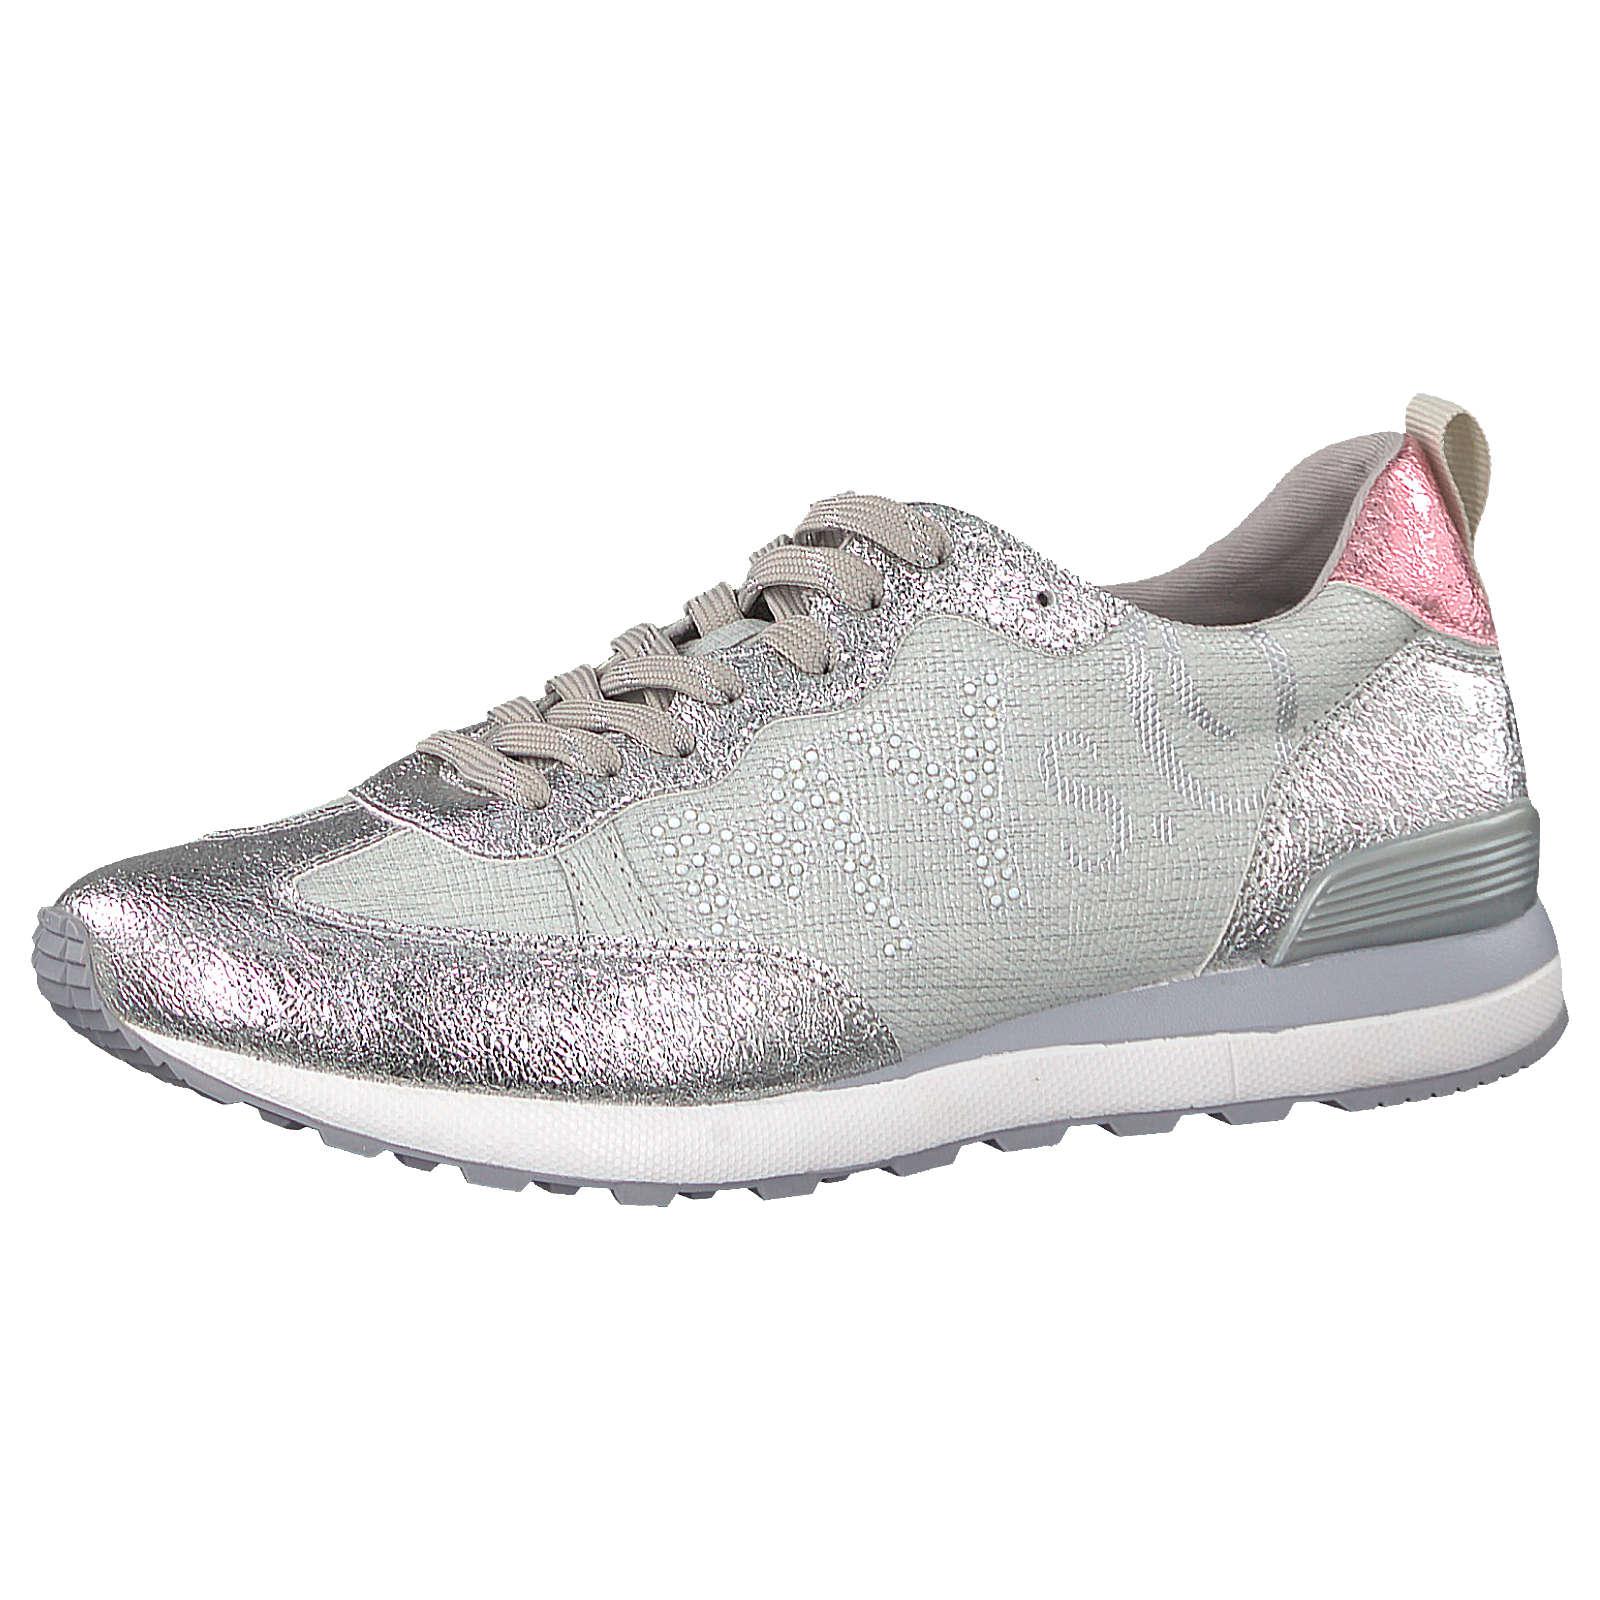 s.Oliver Sneakers Low silber Damen Gr. 37